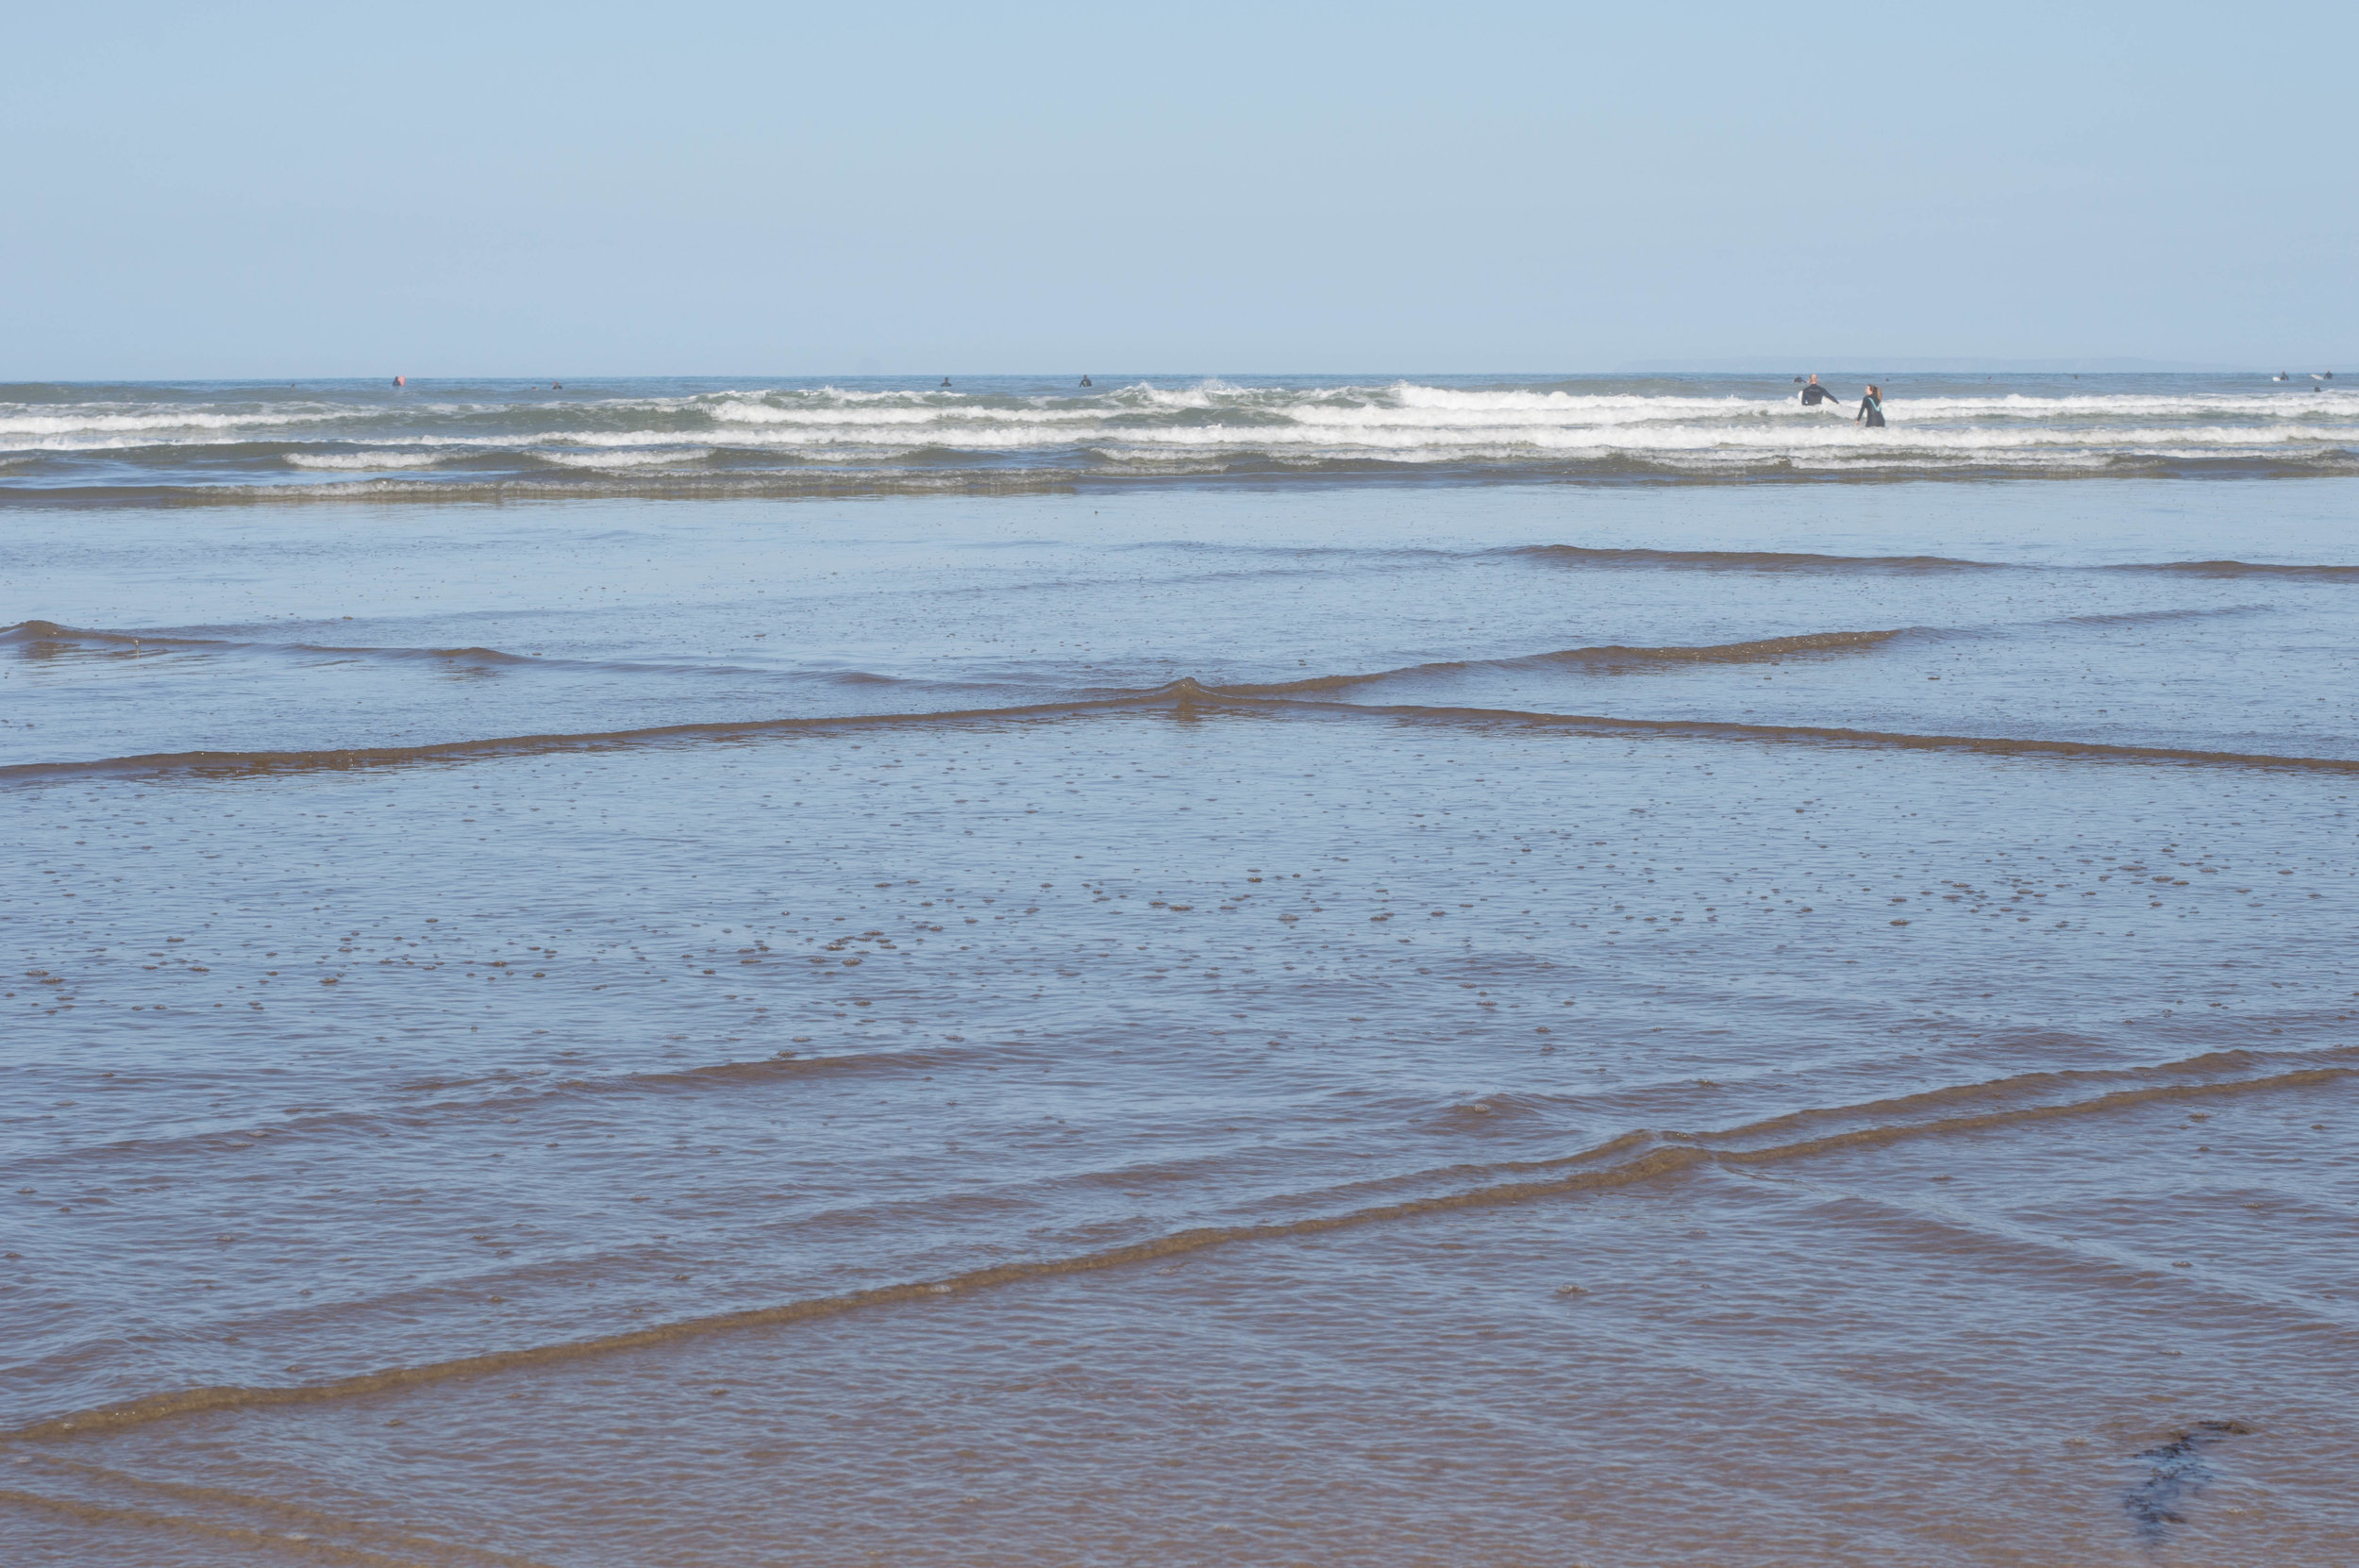 Calming sea ripples